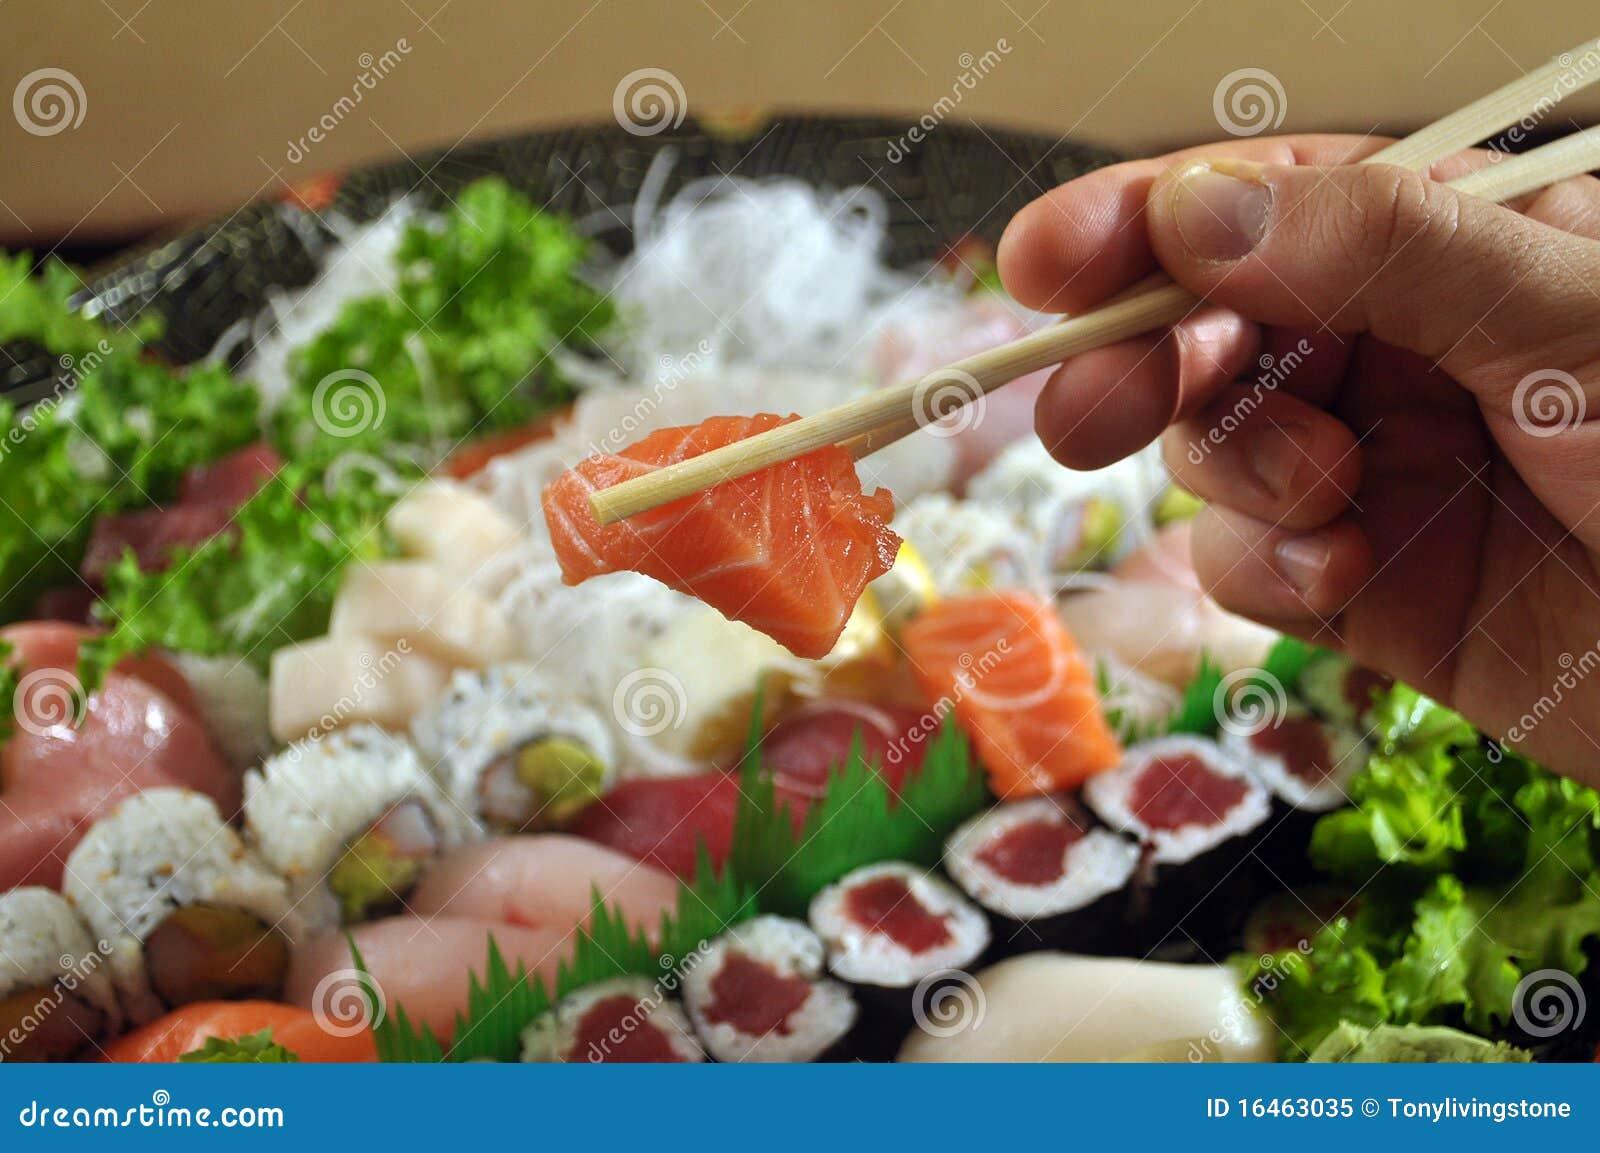 eating sushi royalty free stock photo image 16463035. Black Bedroom Furniture Sets. Home Design Ideas